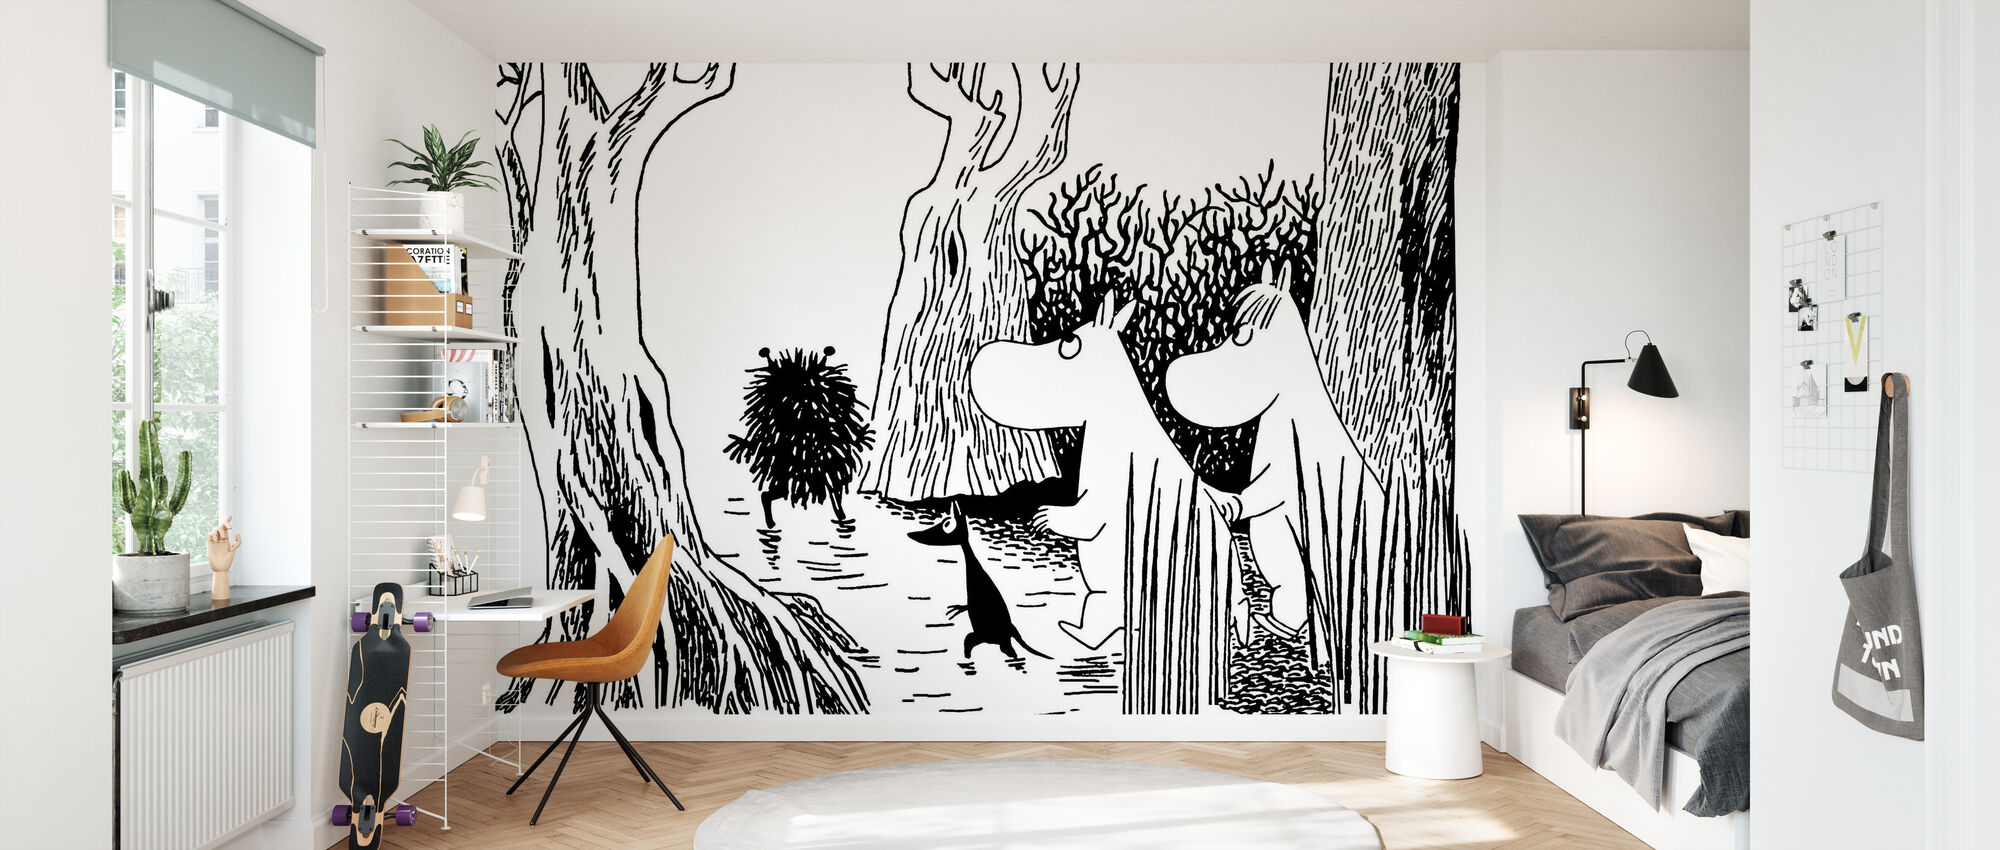 Moomin - Stinky - Wallpaper - Kids Room